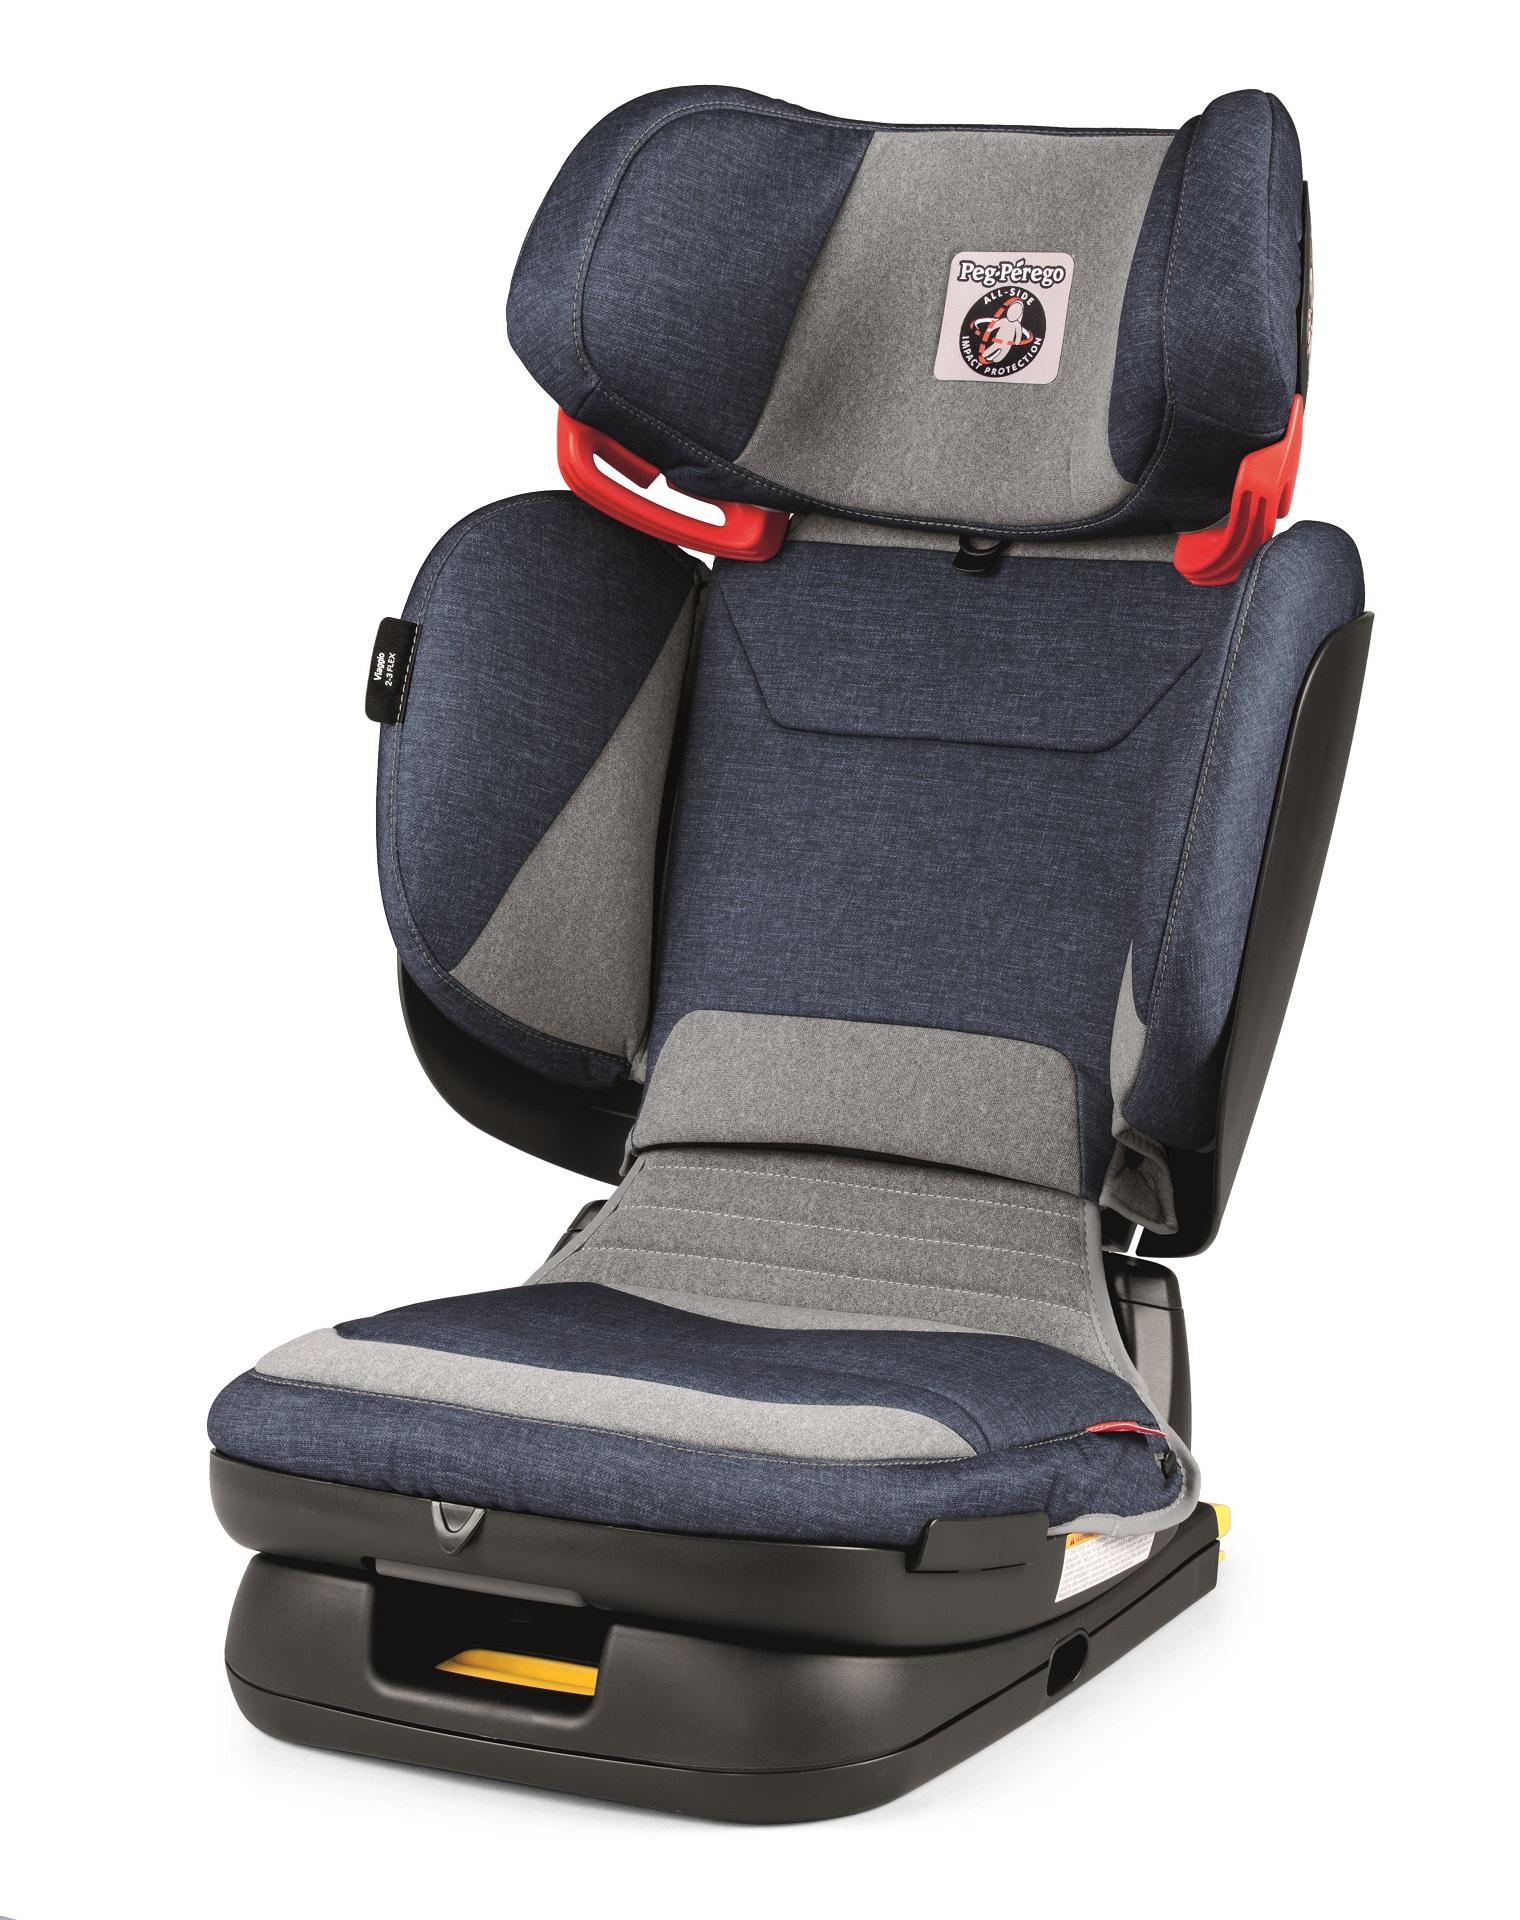 Peg Perego Child Car Seat Viaggio 2-3 Flex 2018 Urban Denim - Buy at ...